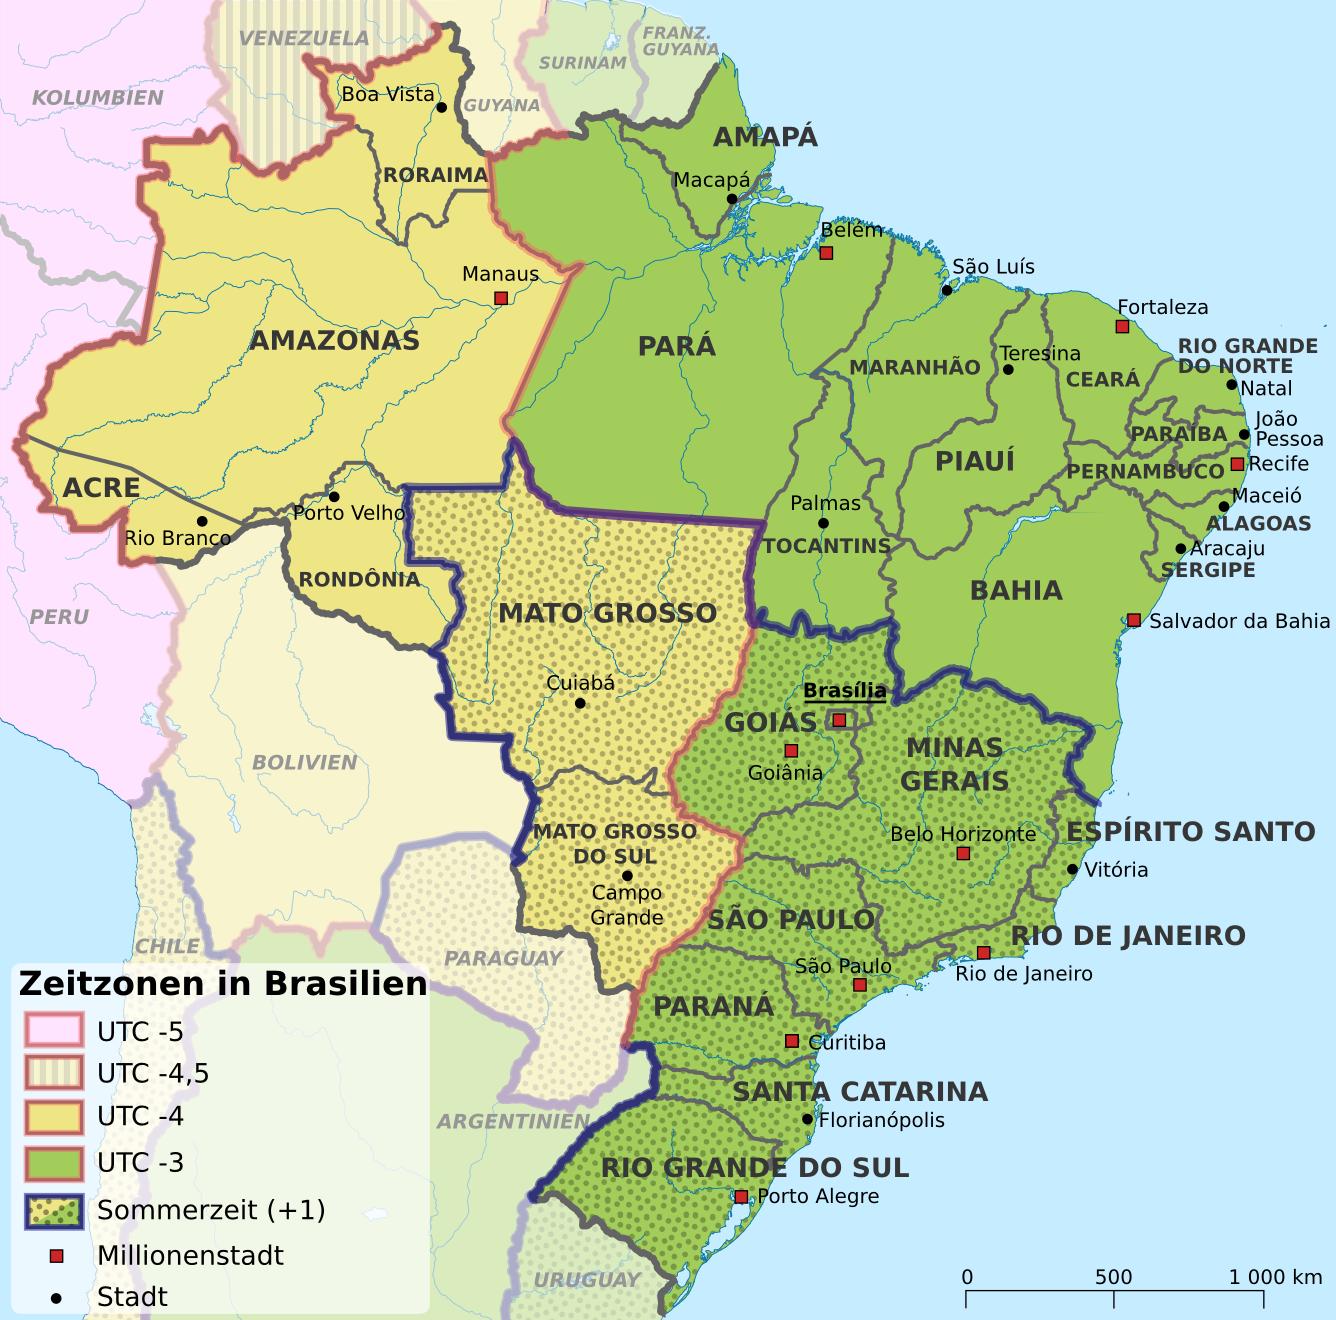 Rio De Janeiro Karte.Brasilien In Karten Ein Link Atlas